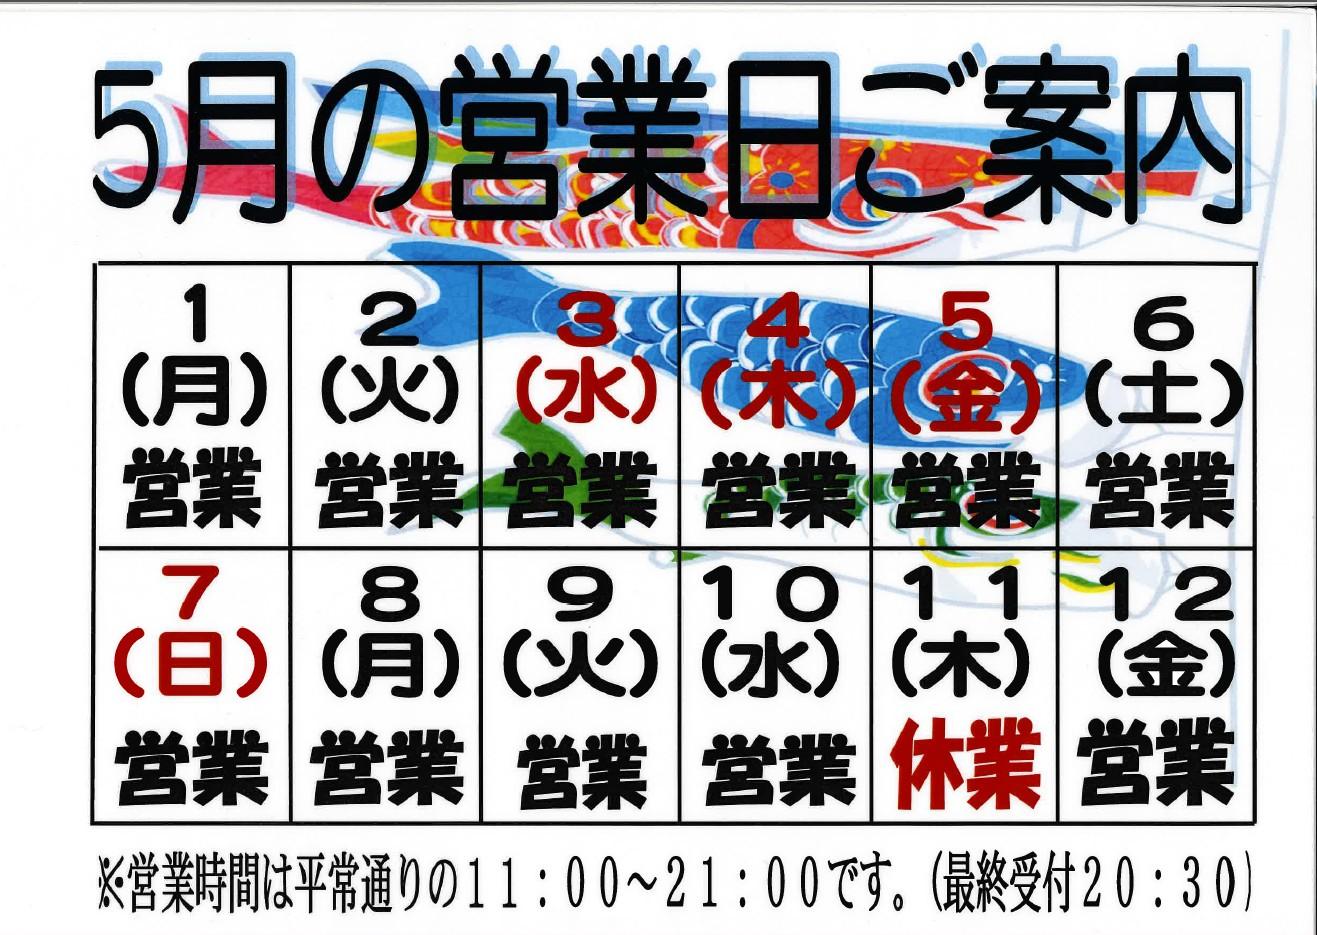 http://www.ajisainosato.com/info/images/2017y04m09d_150738652.jpg